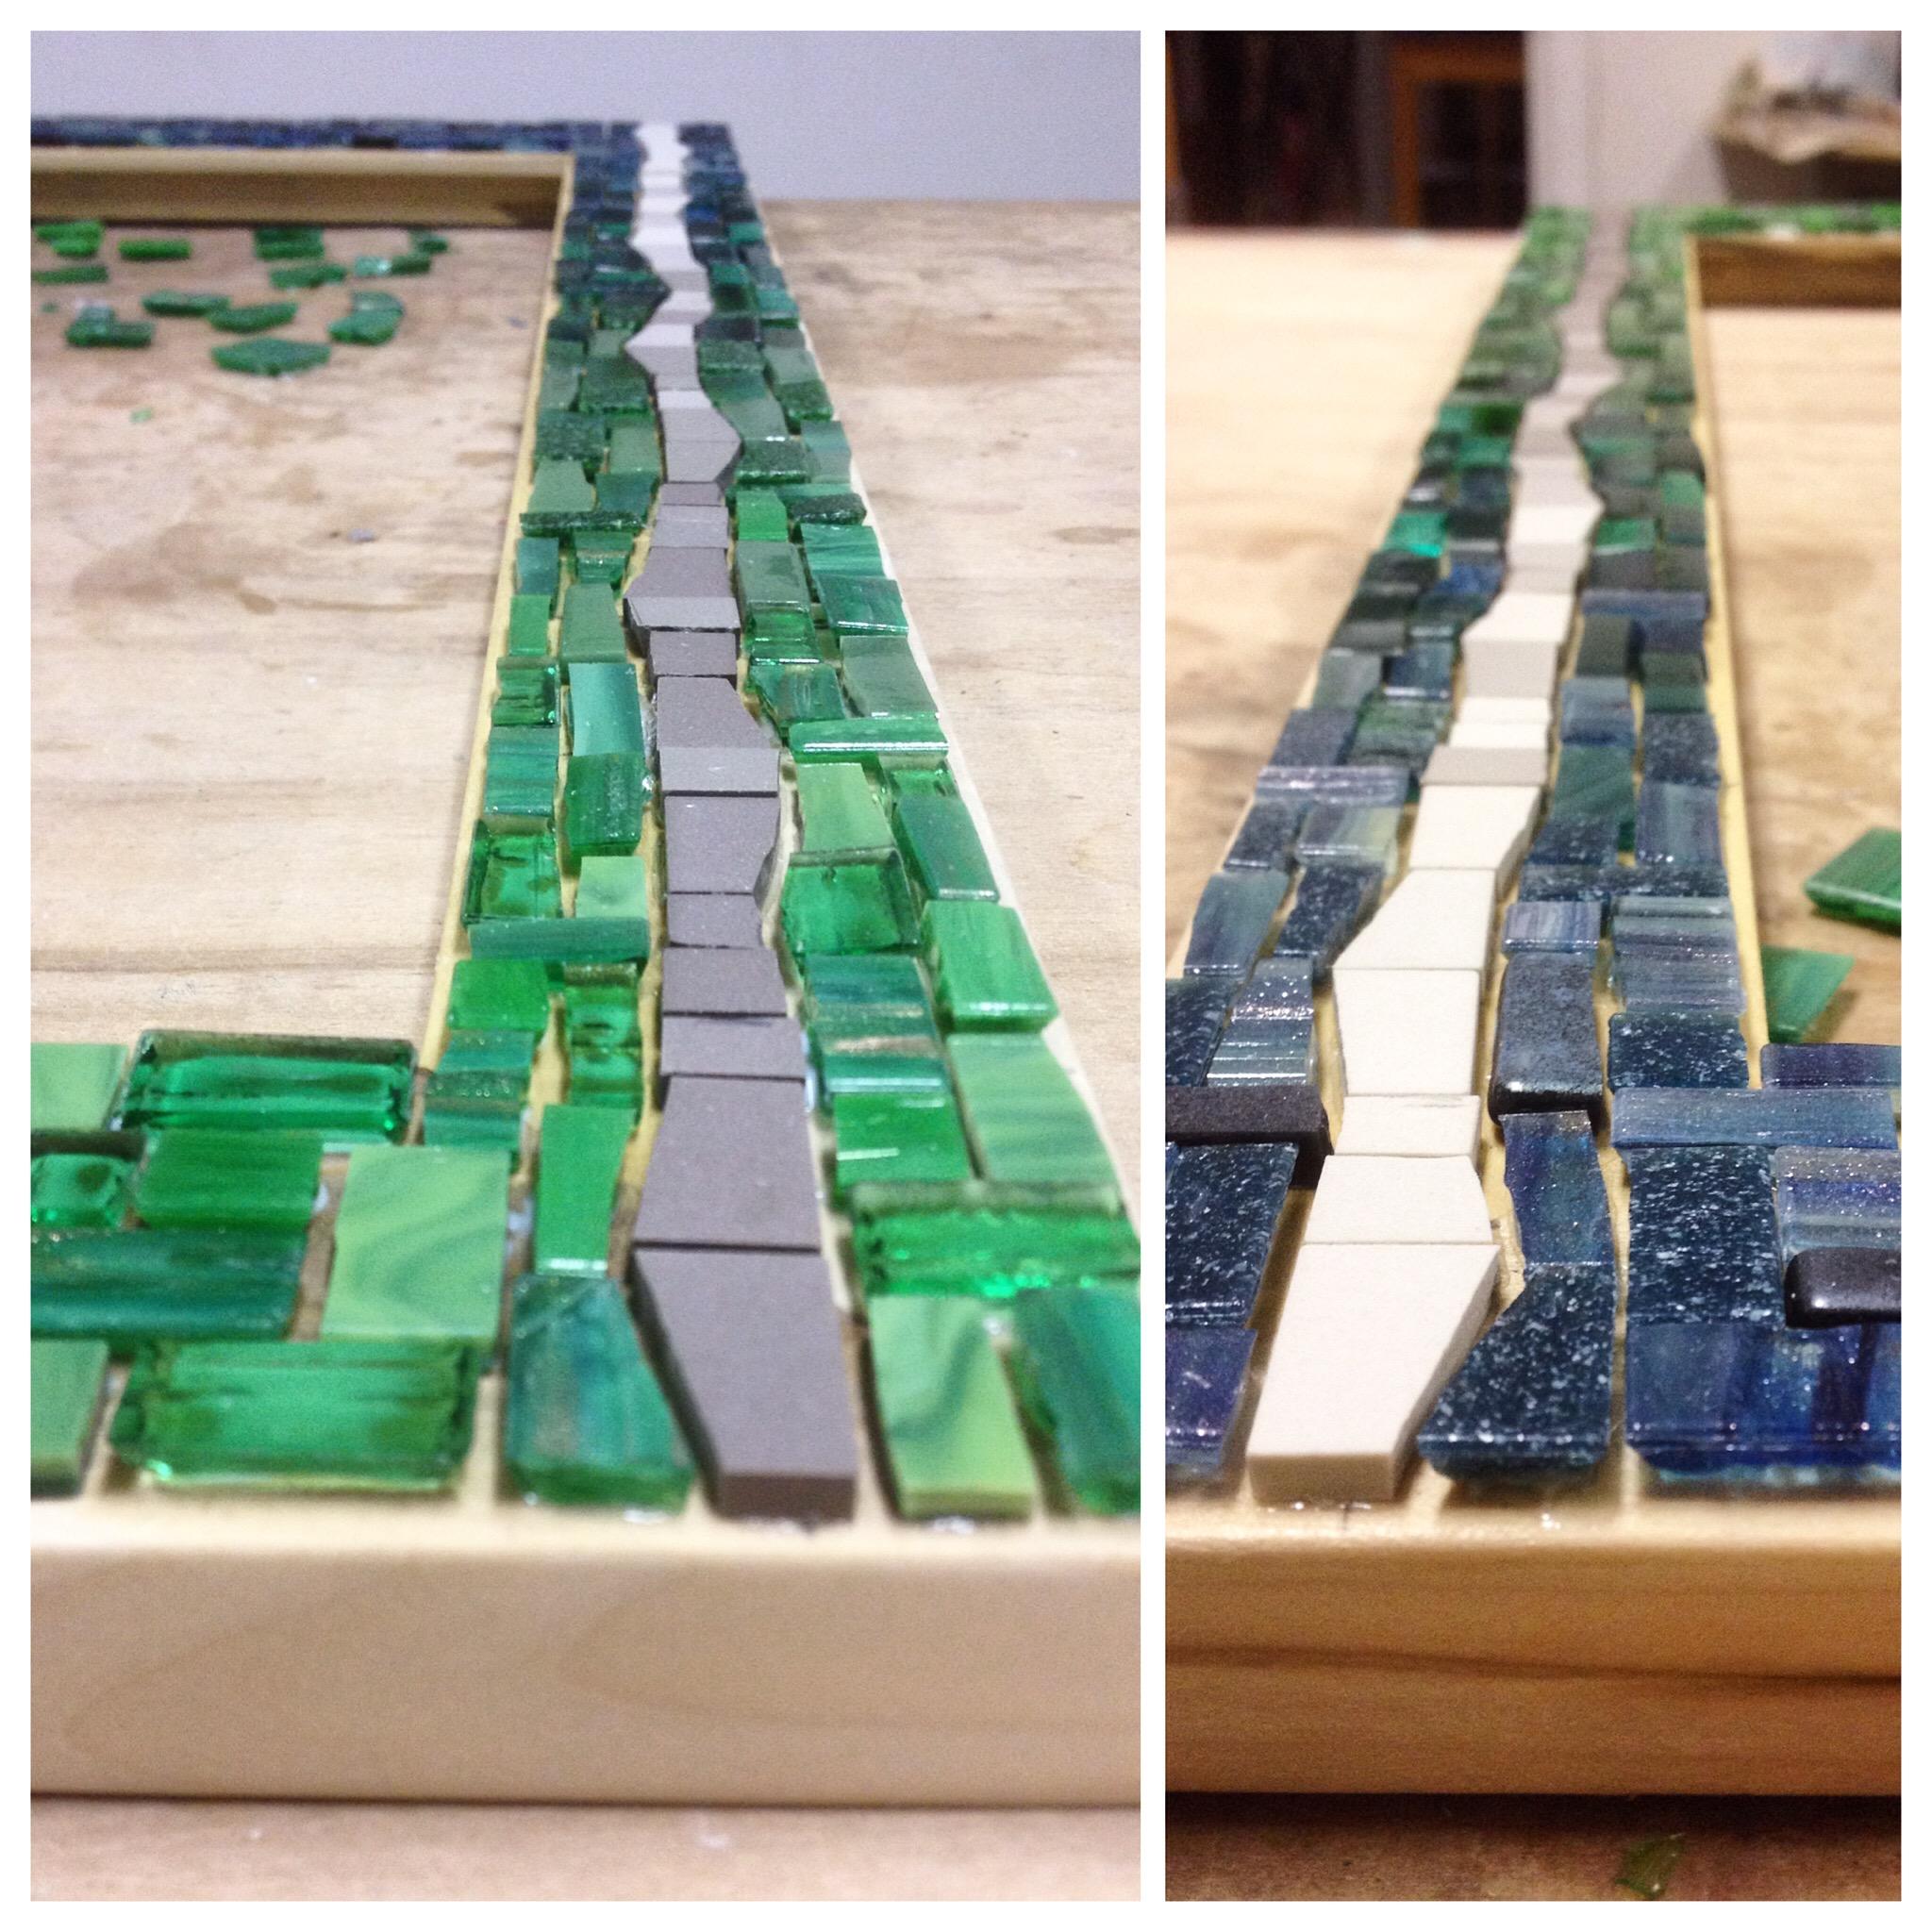 Mosaic mirror process PH2015 (6).JPG